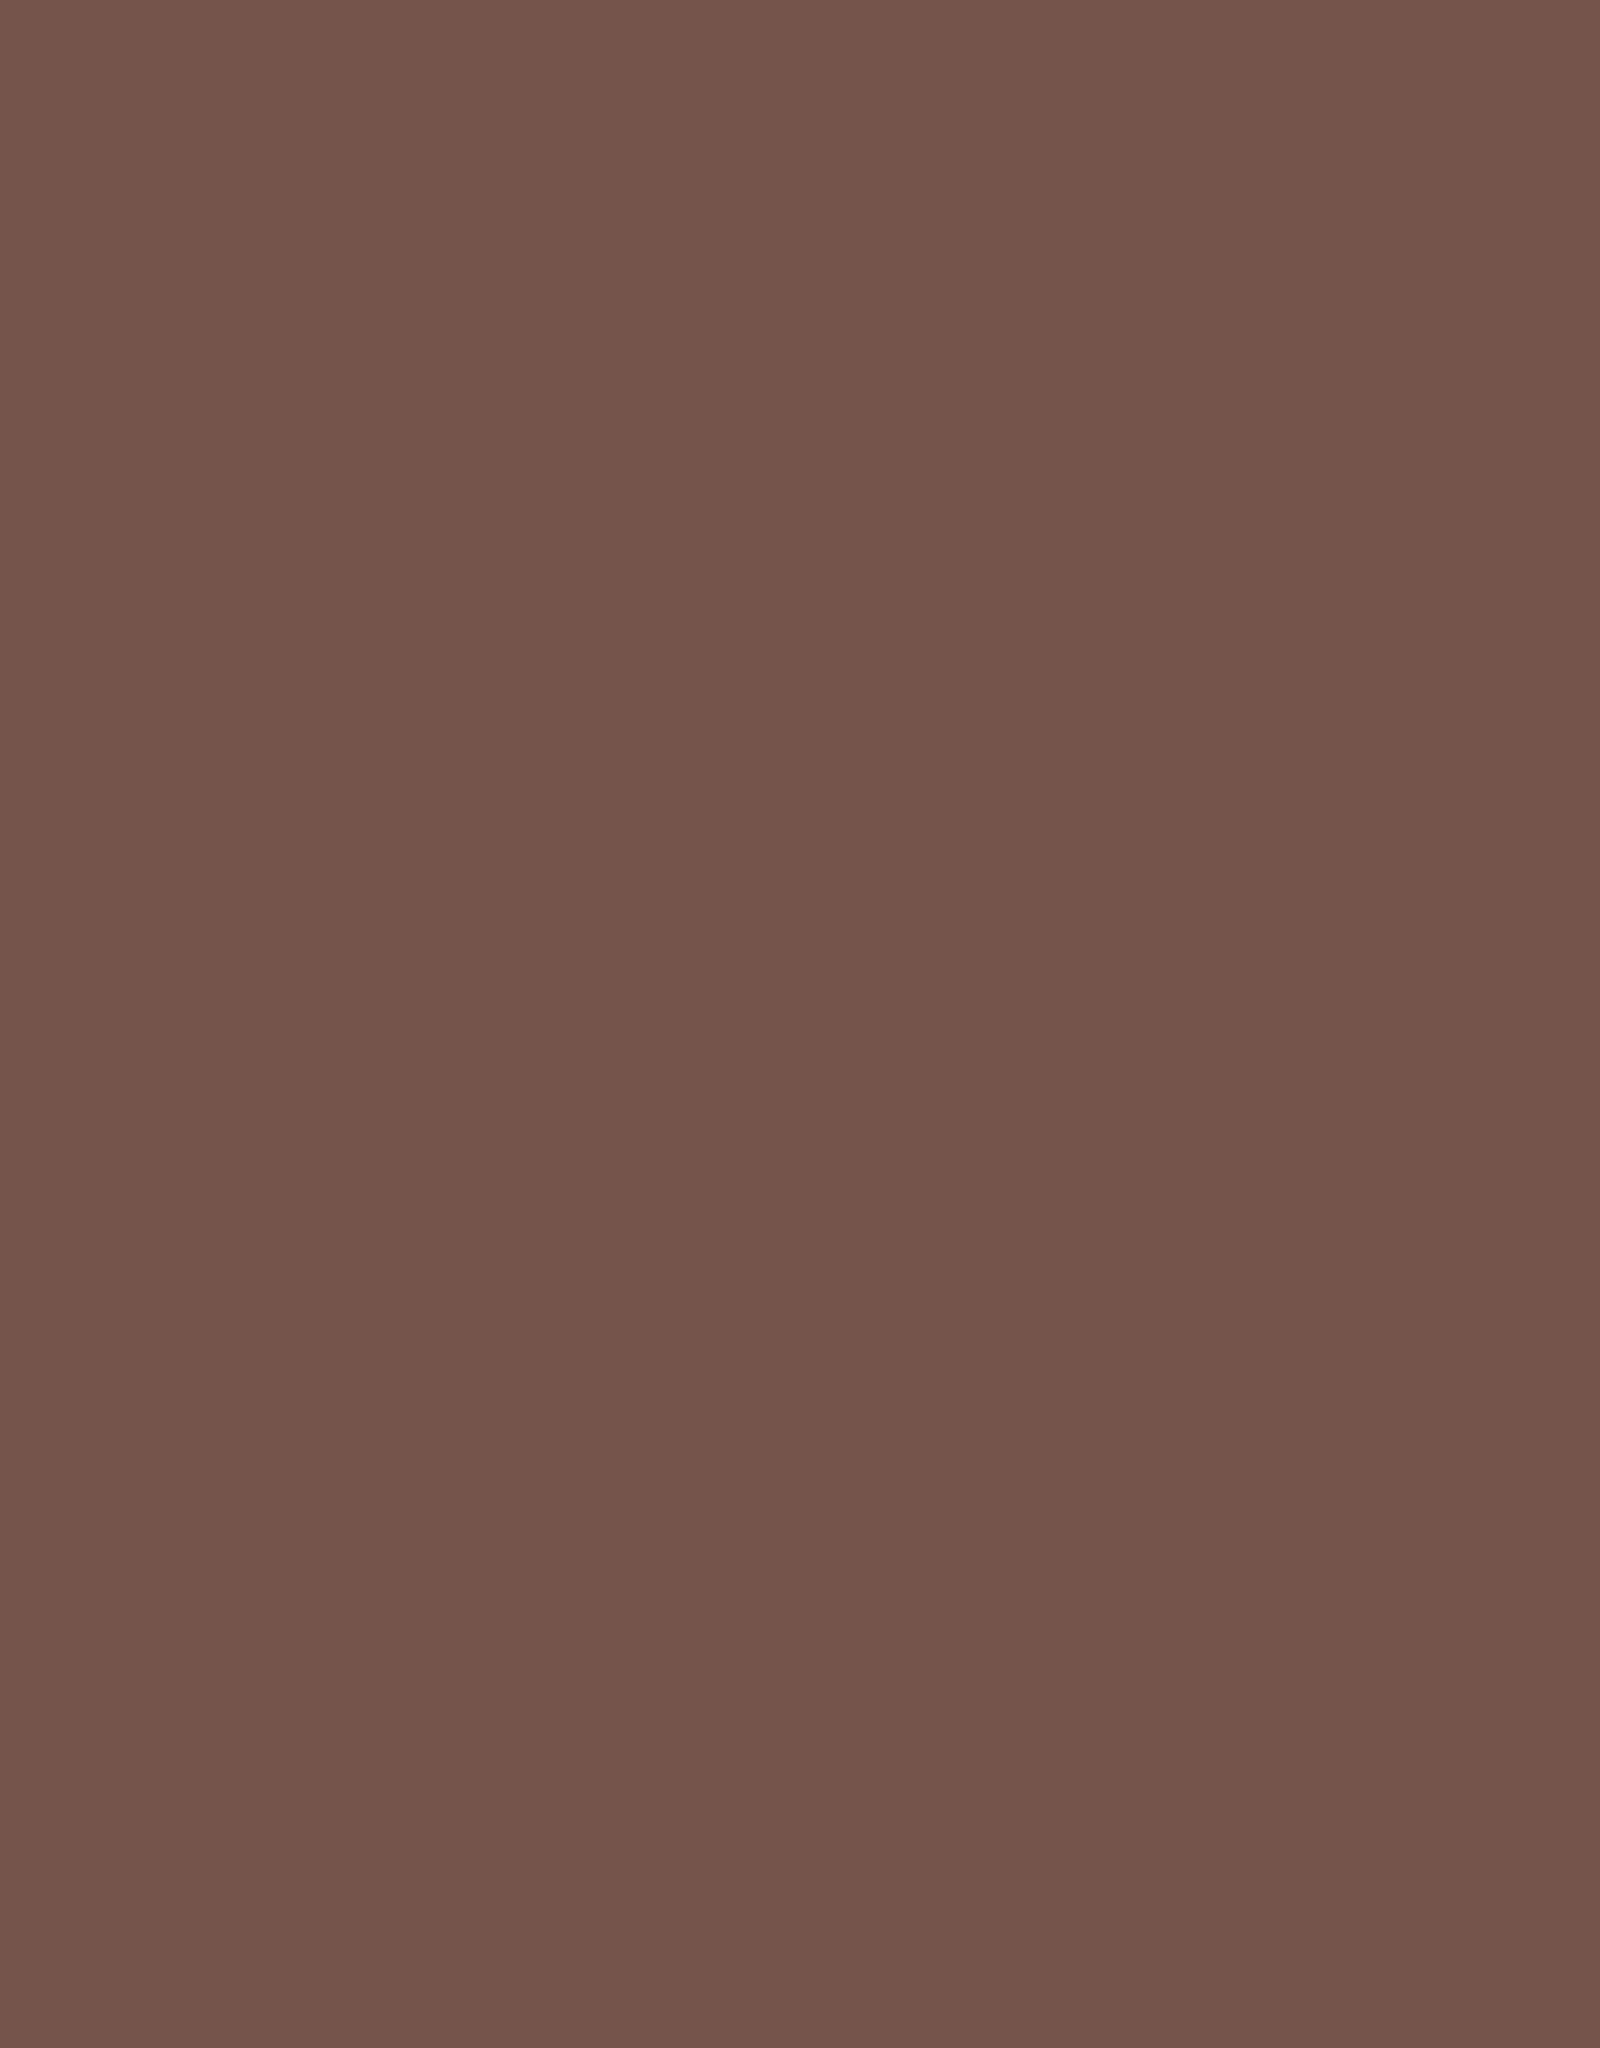 Superior Seamless Superior Seamless Coco Brown #20